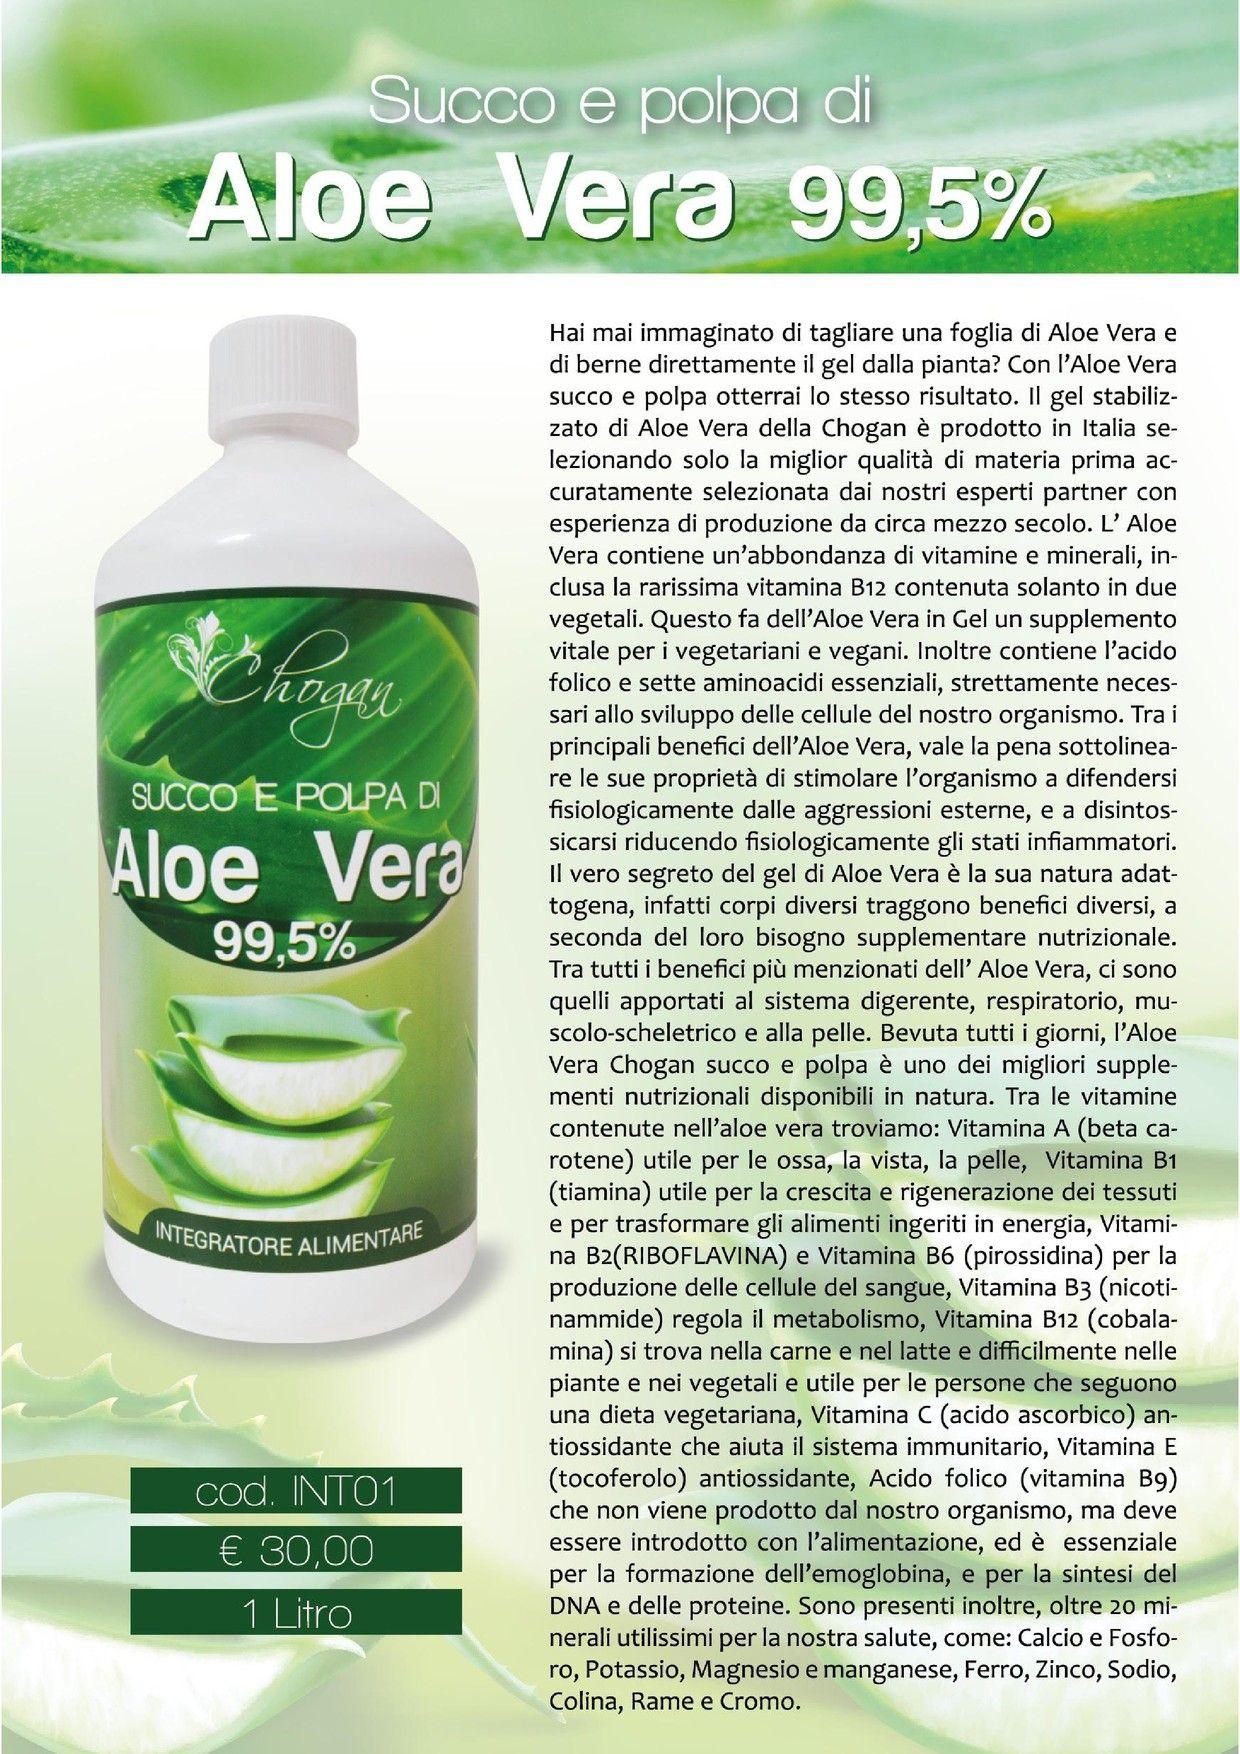 Volantino Chogan Integratori Offerte Salute E Benessere Aloe Salute E Benessere Aloe Vera